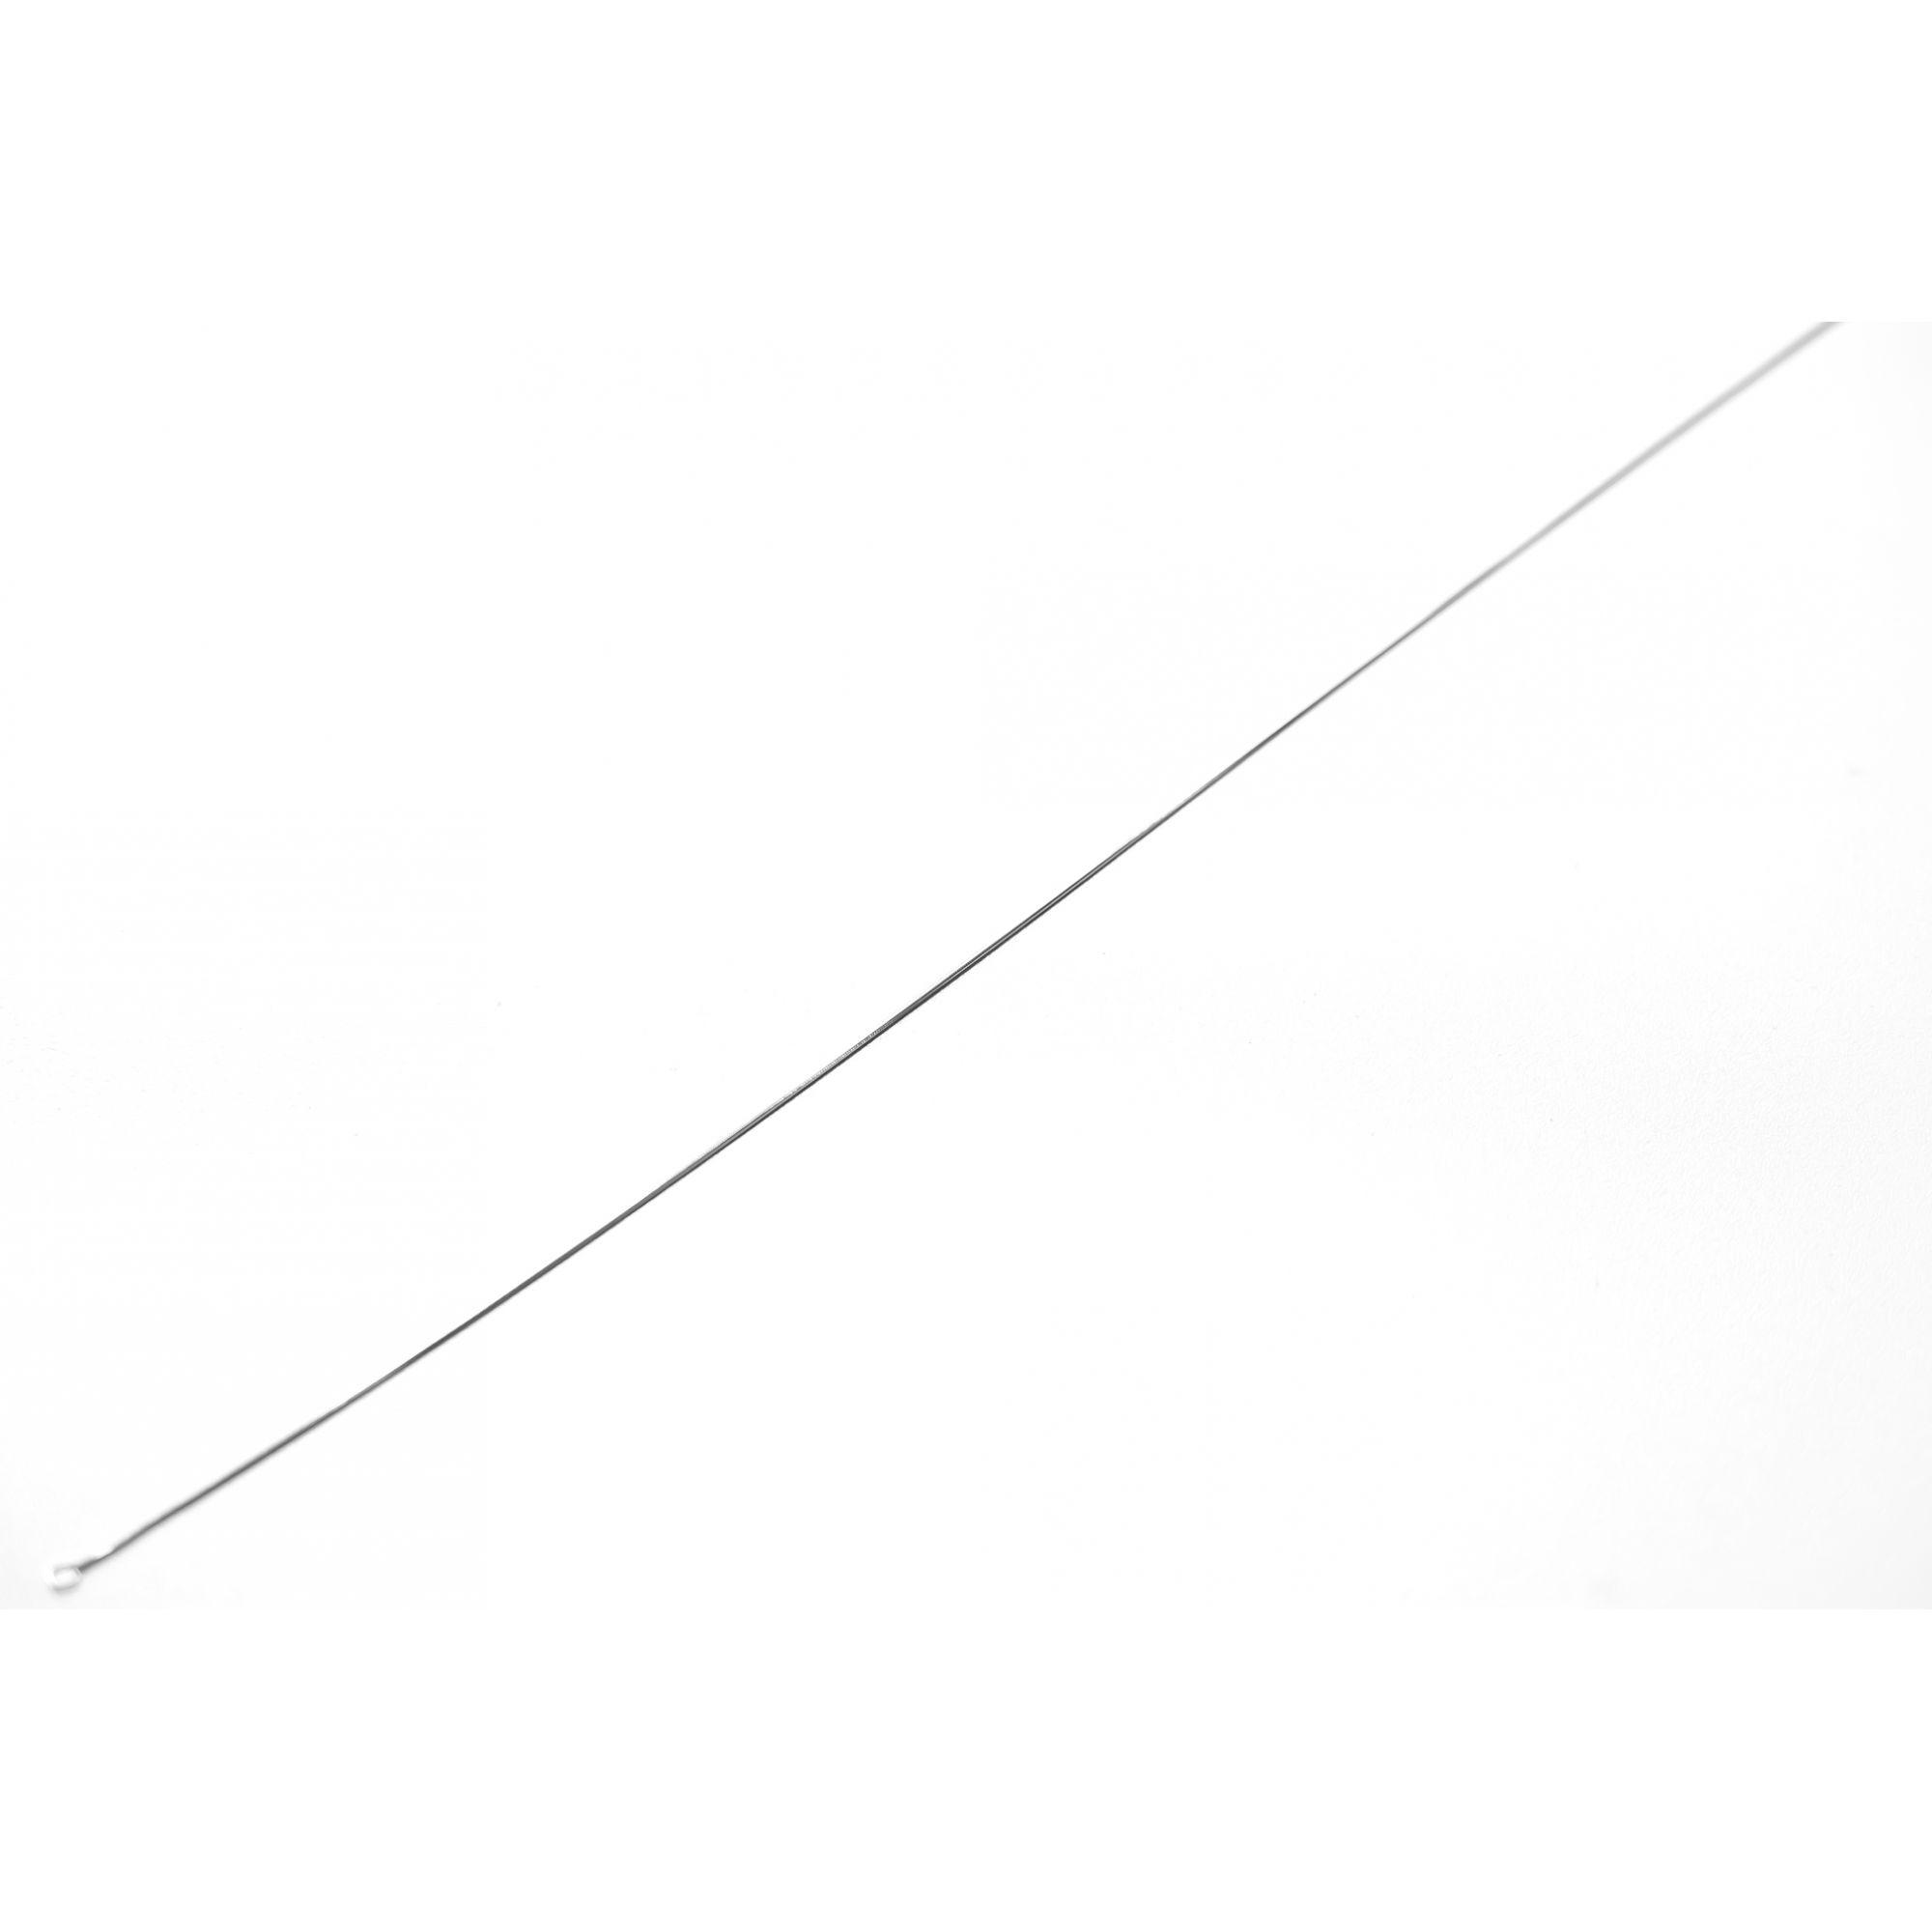 CORRENTE RABO DE RATO - 50 cm